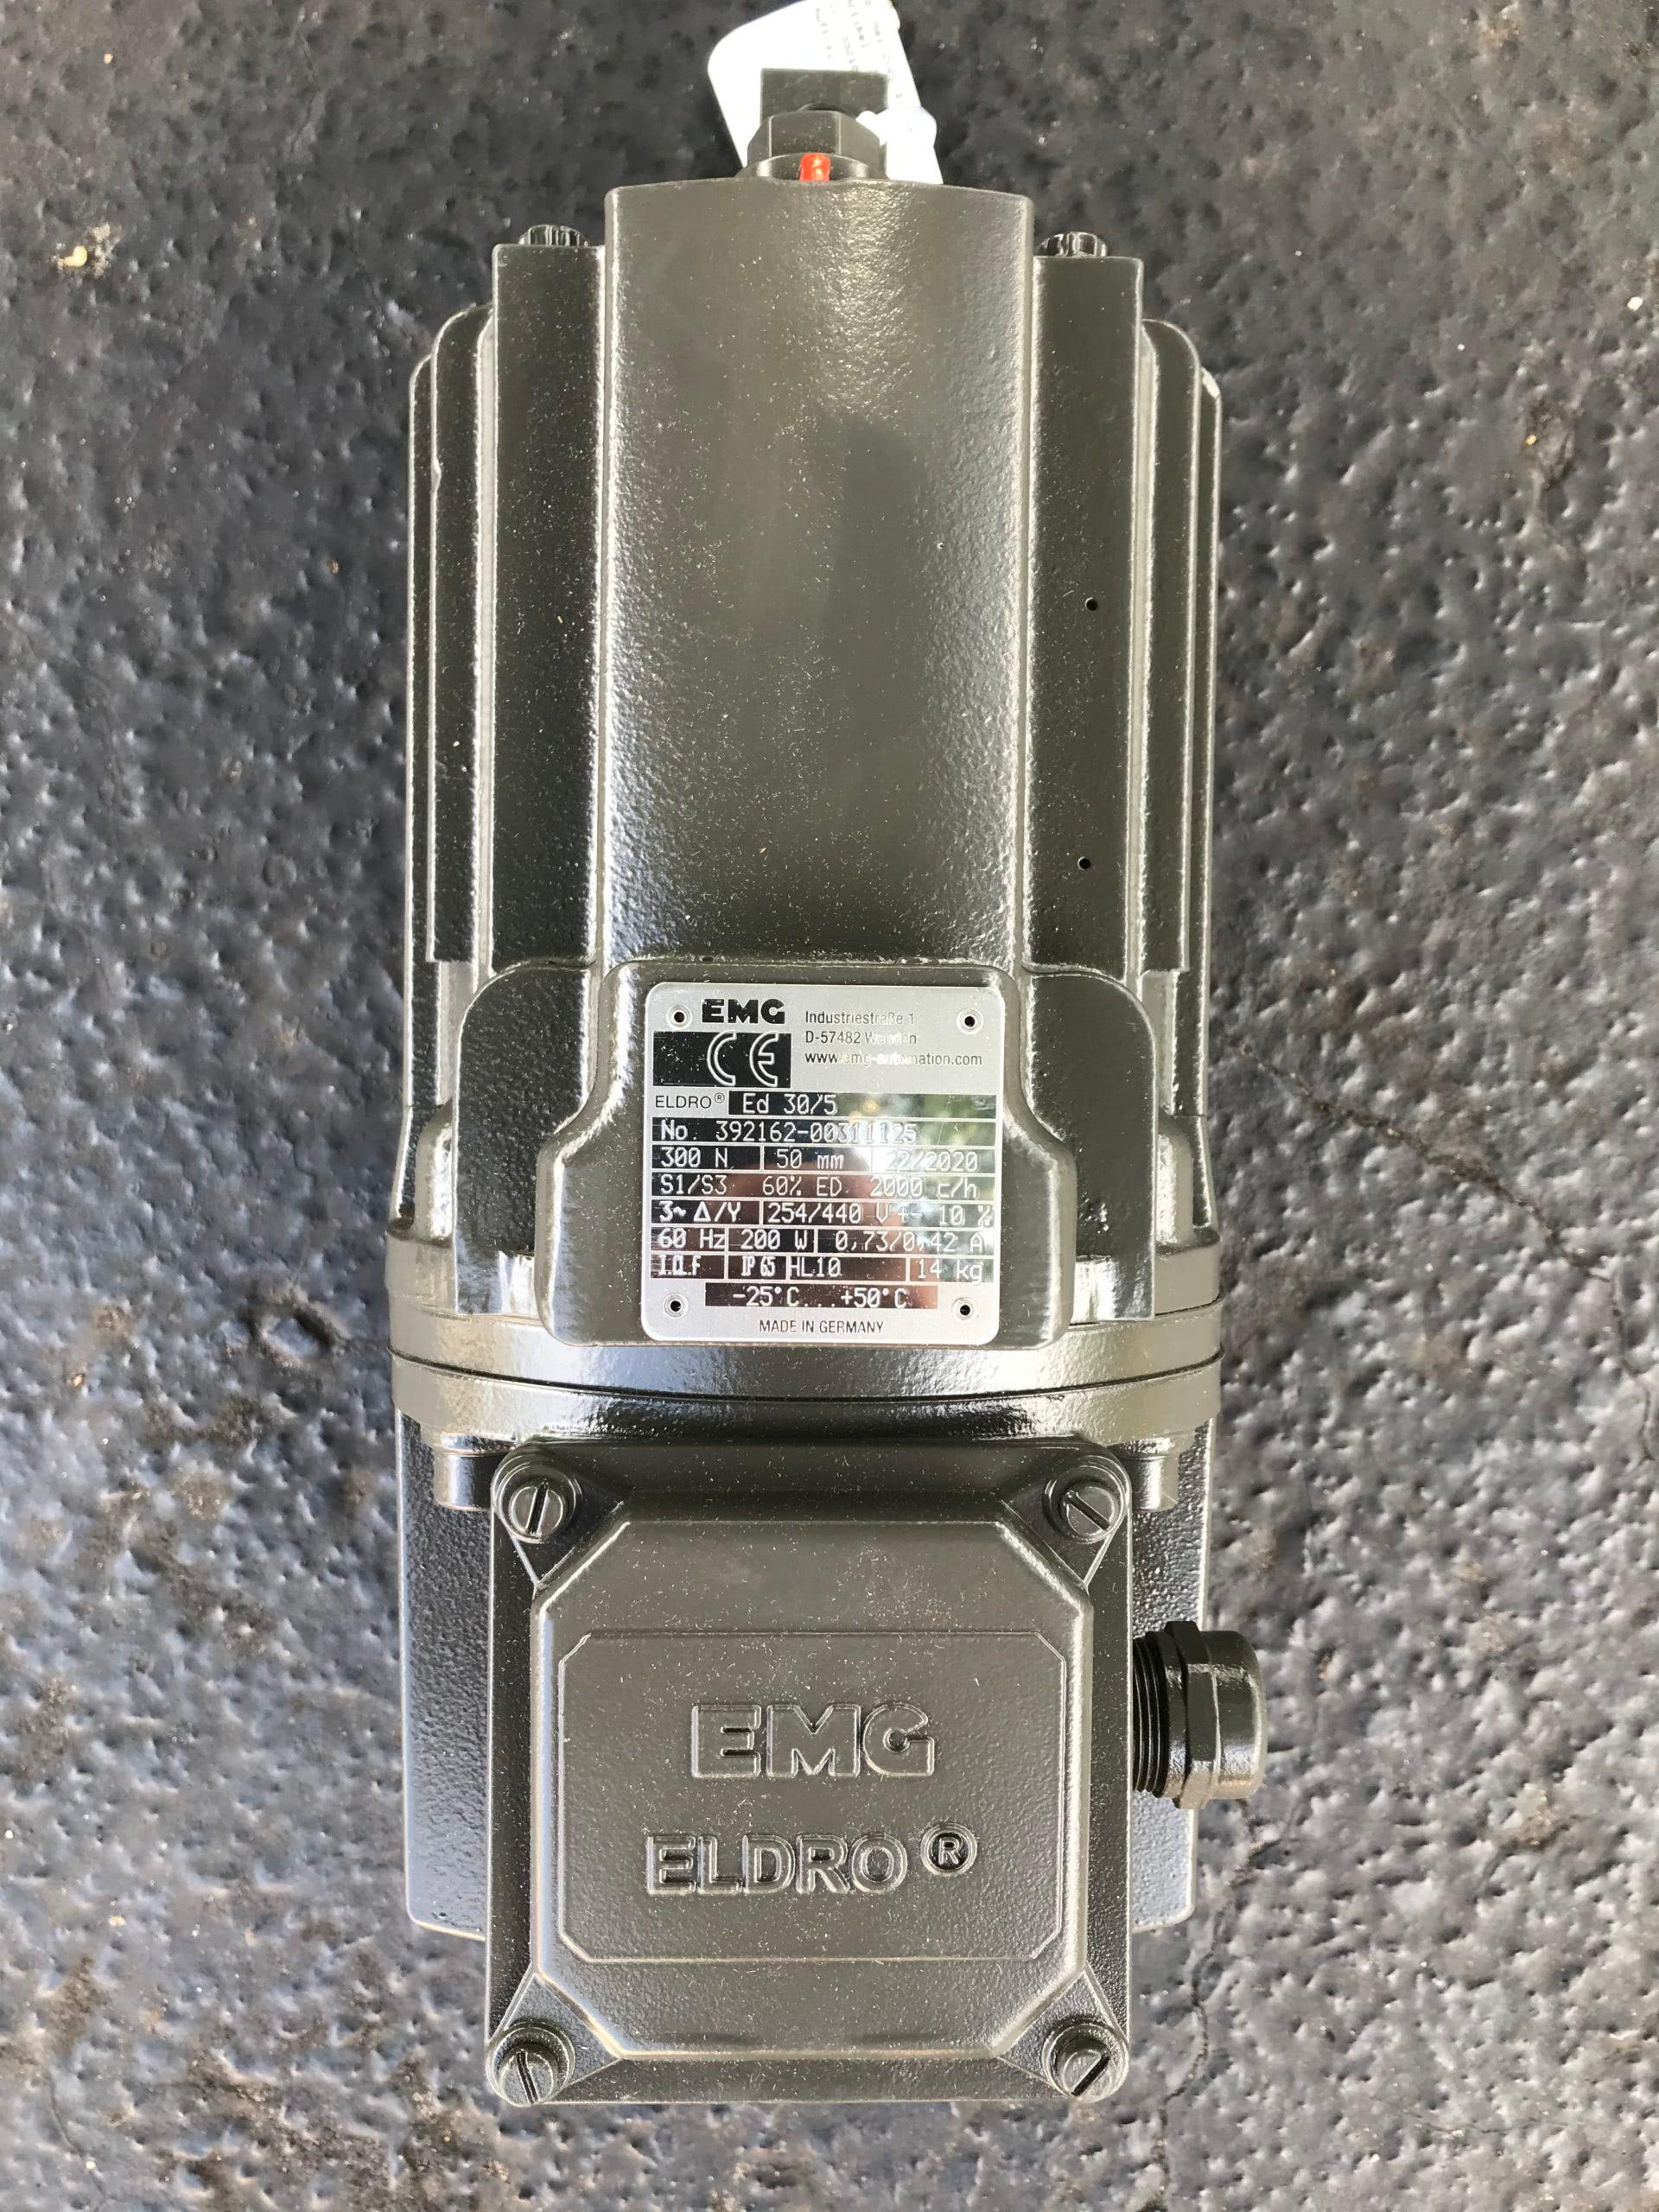 ED 30/5, EMG Eldro thruster, electrohydraulic thruster